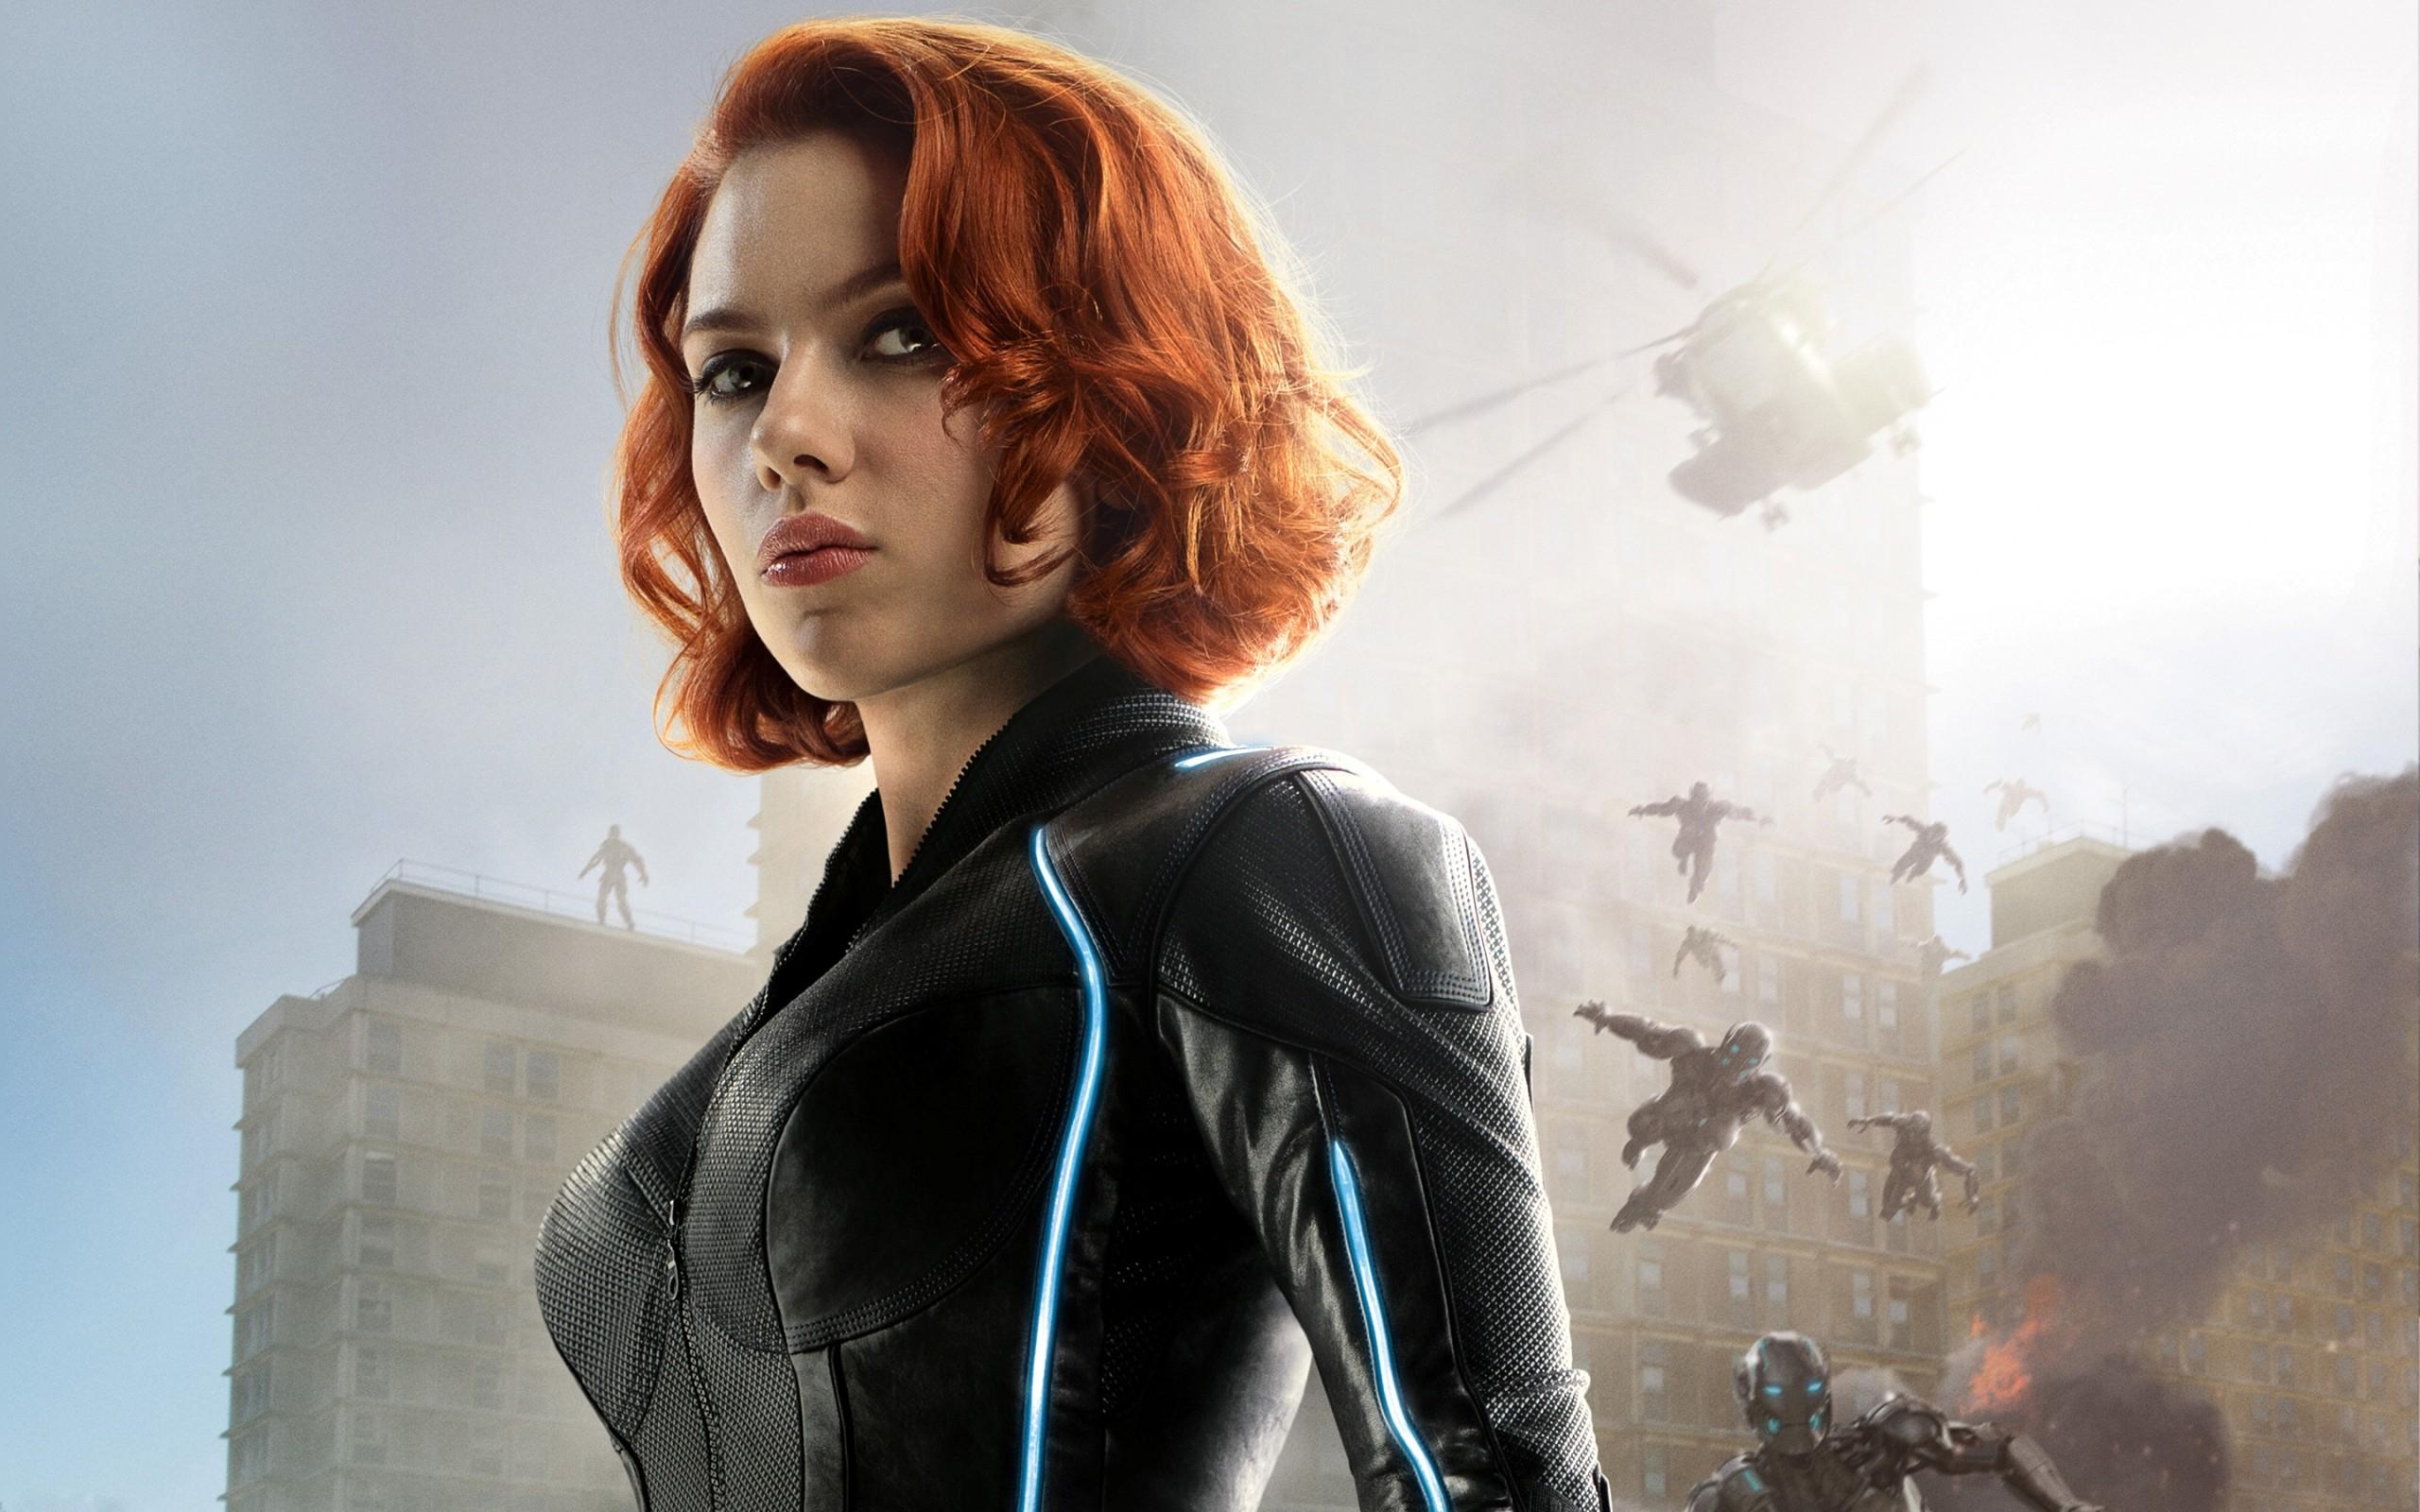 Wallpaper Women Redhead Model Actress Fashion The Avengers